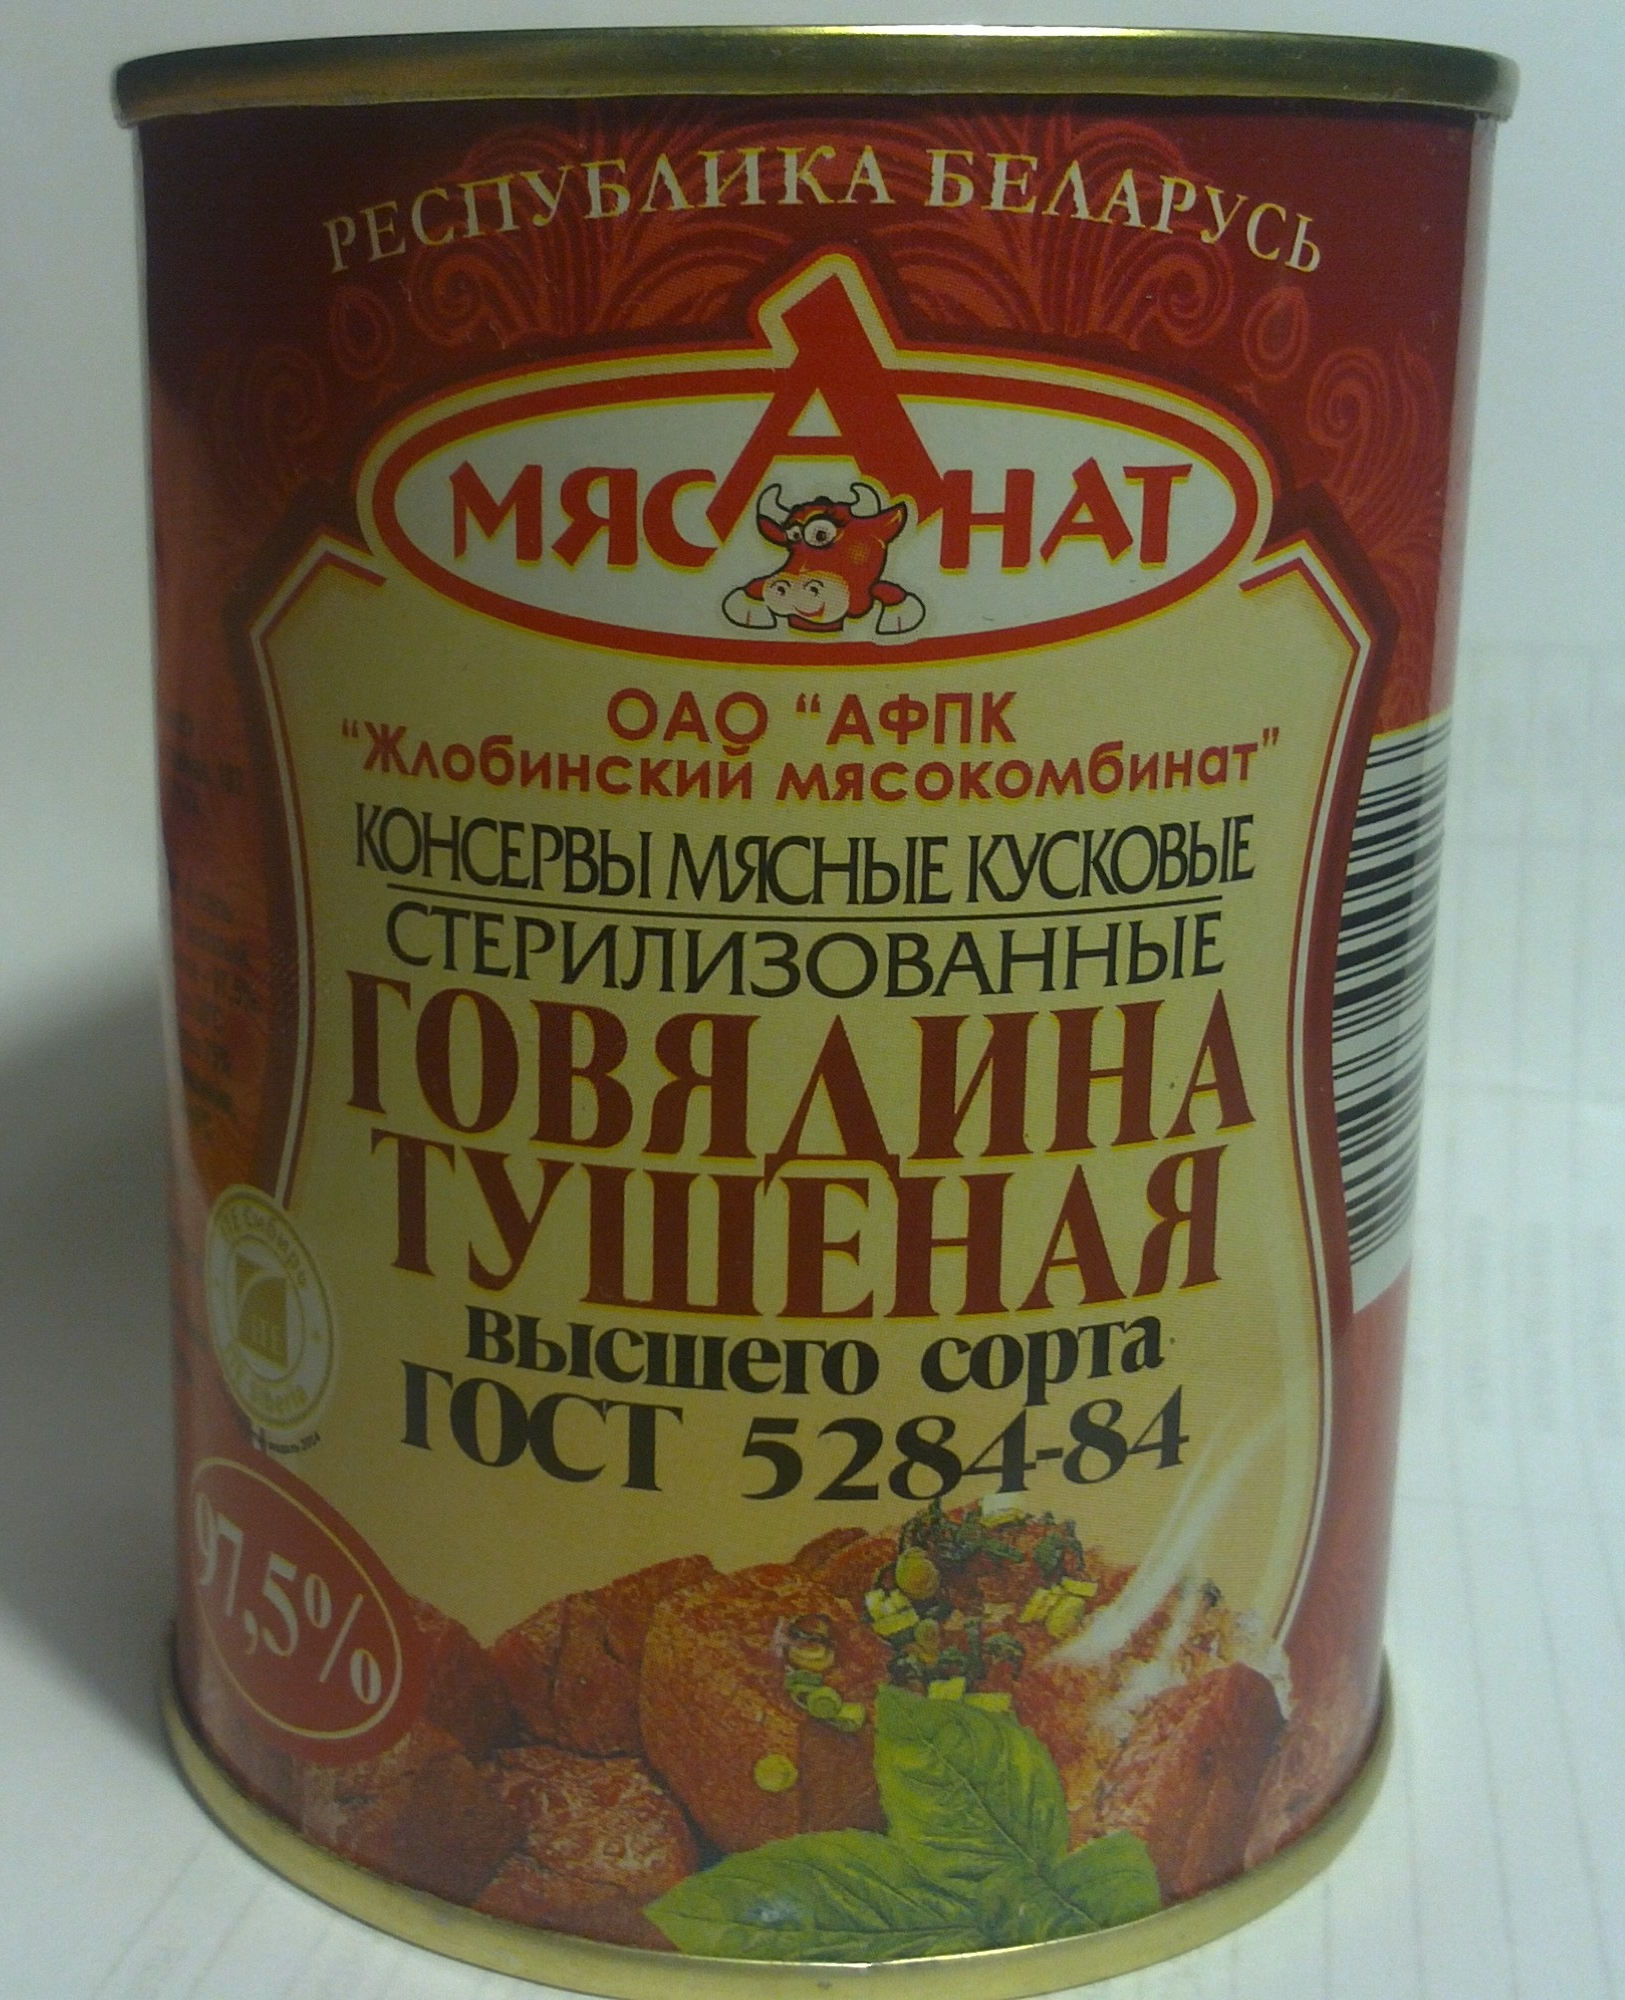 Говядина тушеная В/С  Ж/Б 338г Жлобинский мясокомбинат